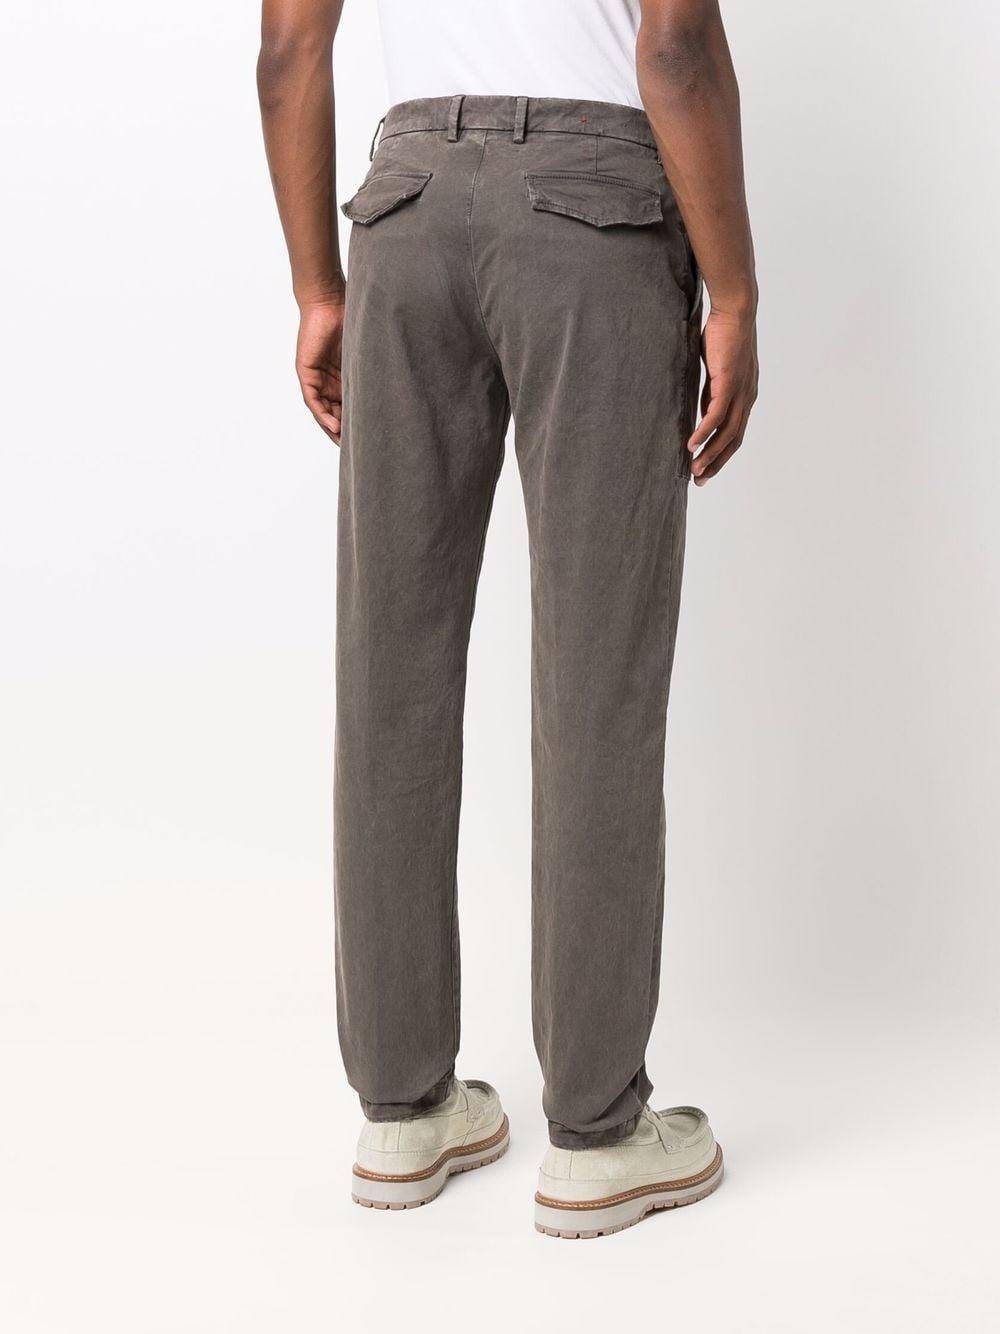 Pantaloni a gamba dritta in cotone stretch grigio medio ELEVENTY | Pantaloni | D75PAND05-TET0C00609